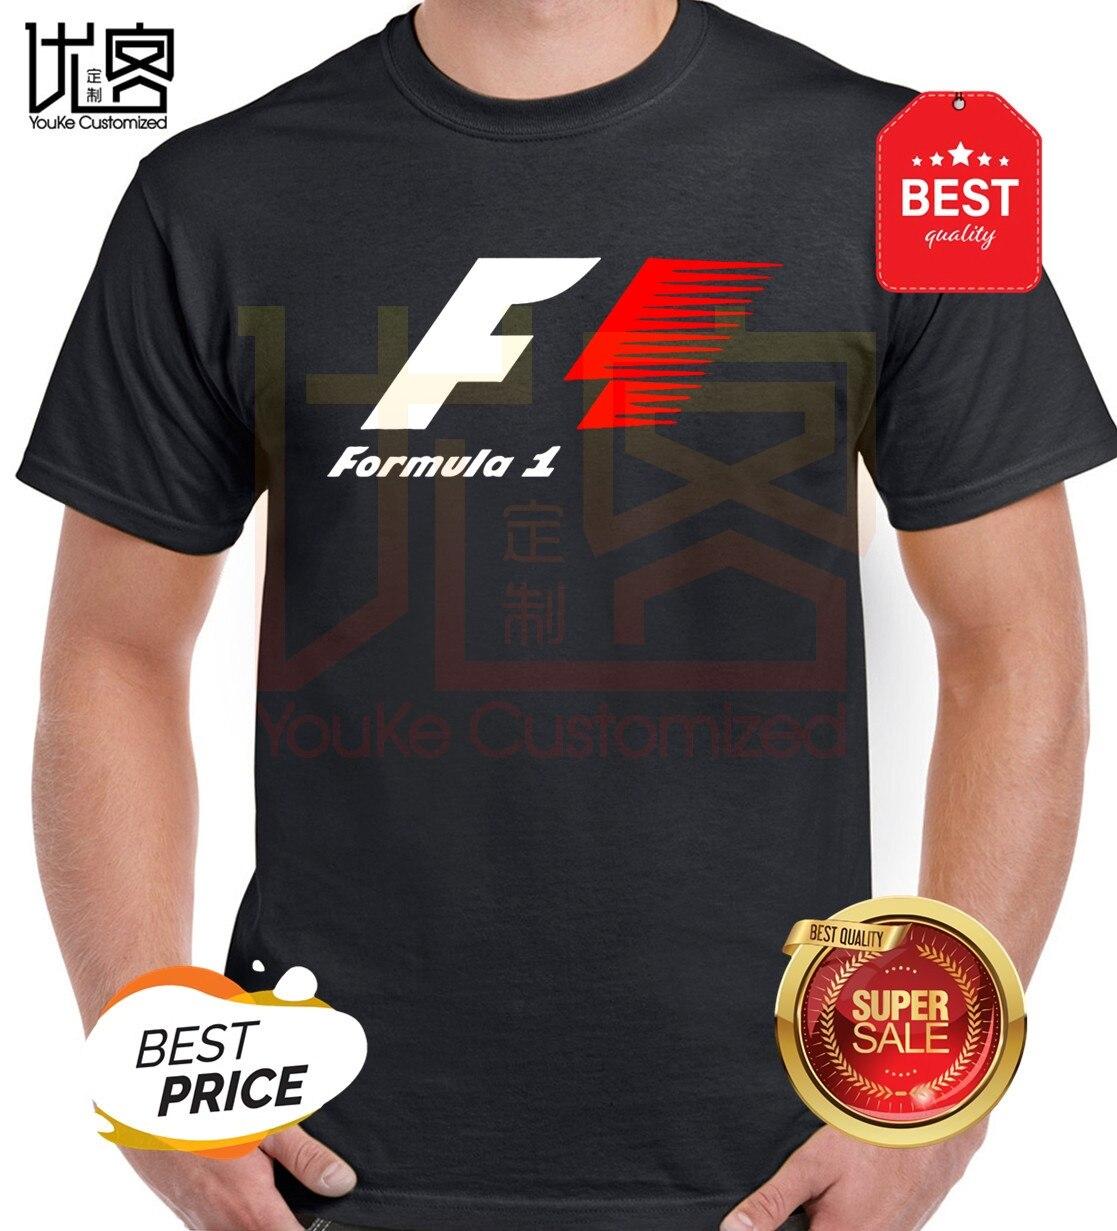 AYRTON SENNA LOGO LEGEND RACER F1 CHAMPIONSHIP man t-shirt 100/% cotton